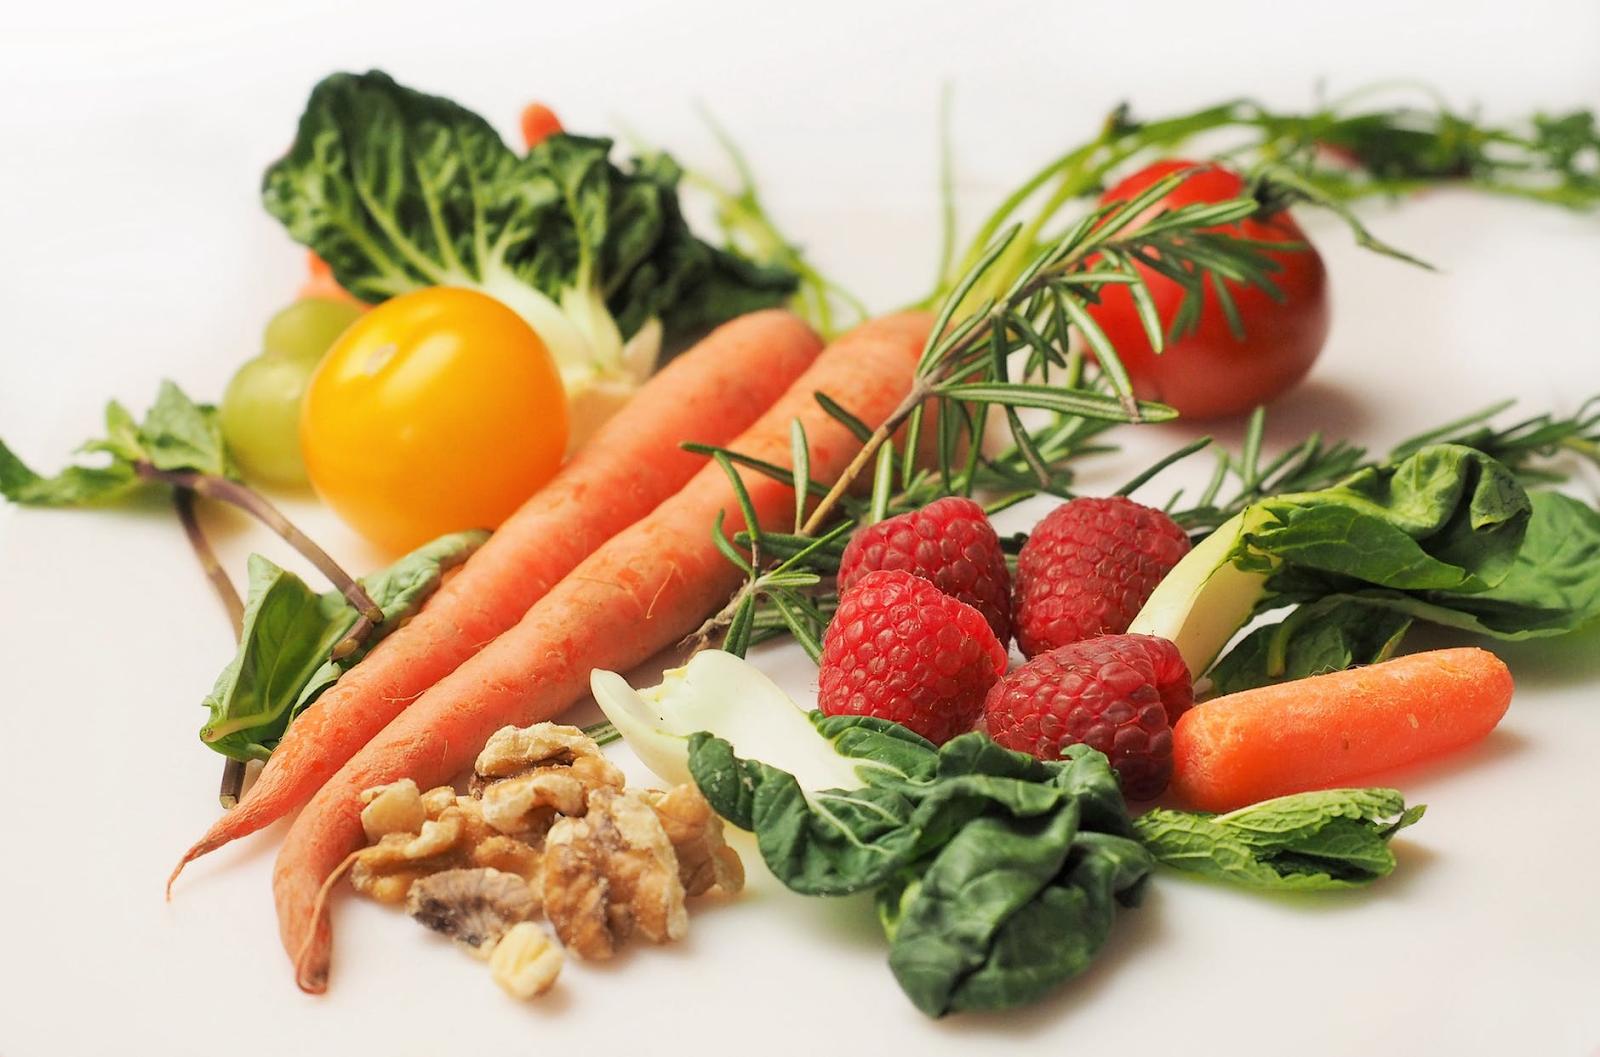 Vegetables, nuts, and berries